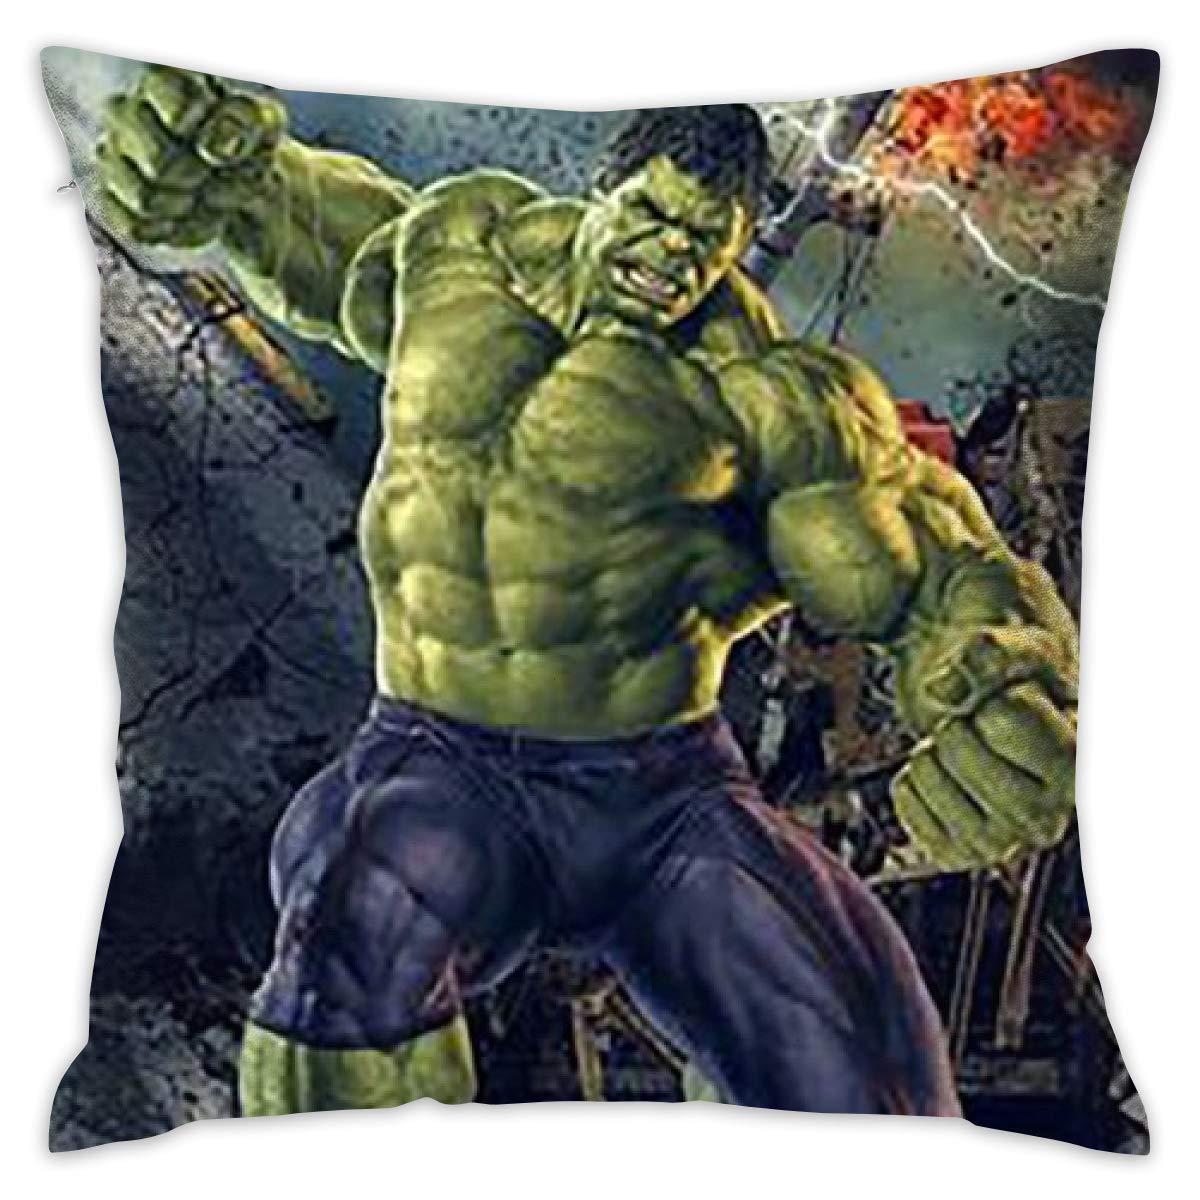 Amazon.com: XOJ07B - Funda de almohada con cremallera oculta ...